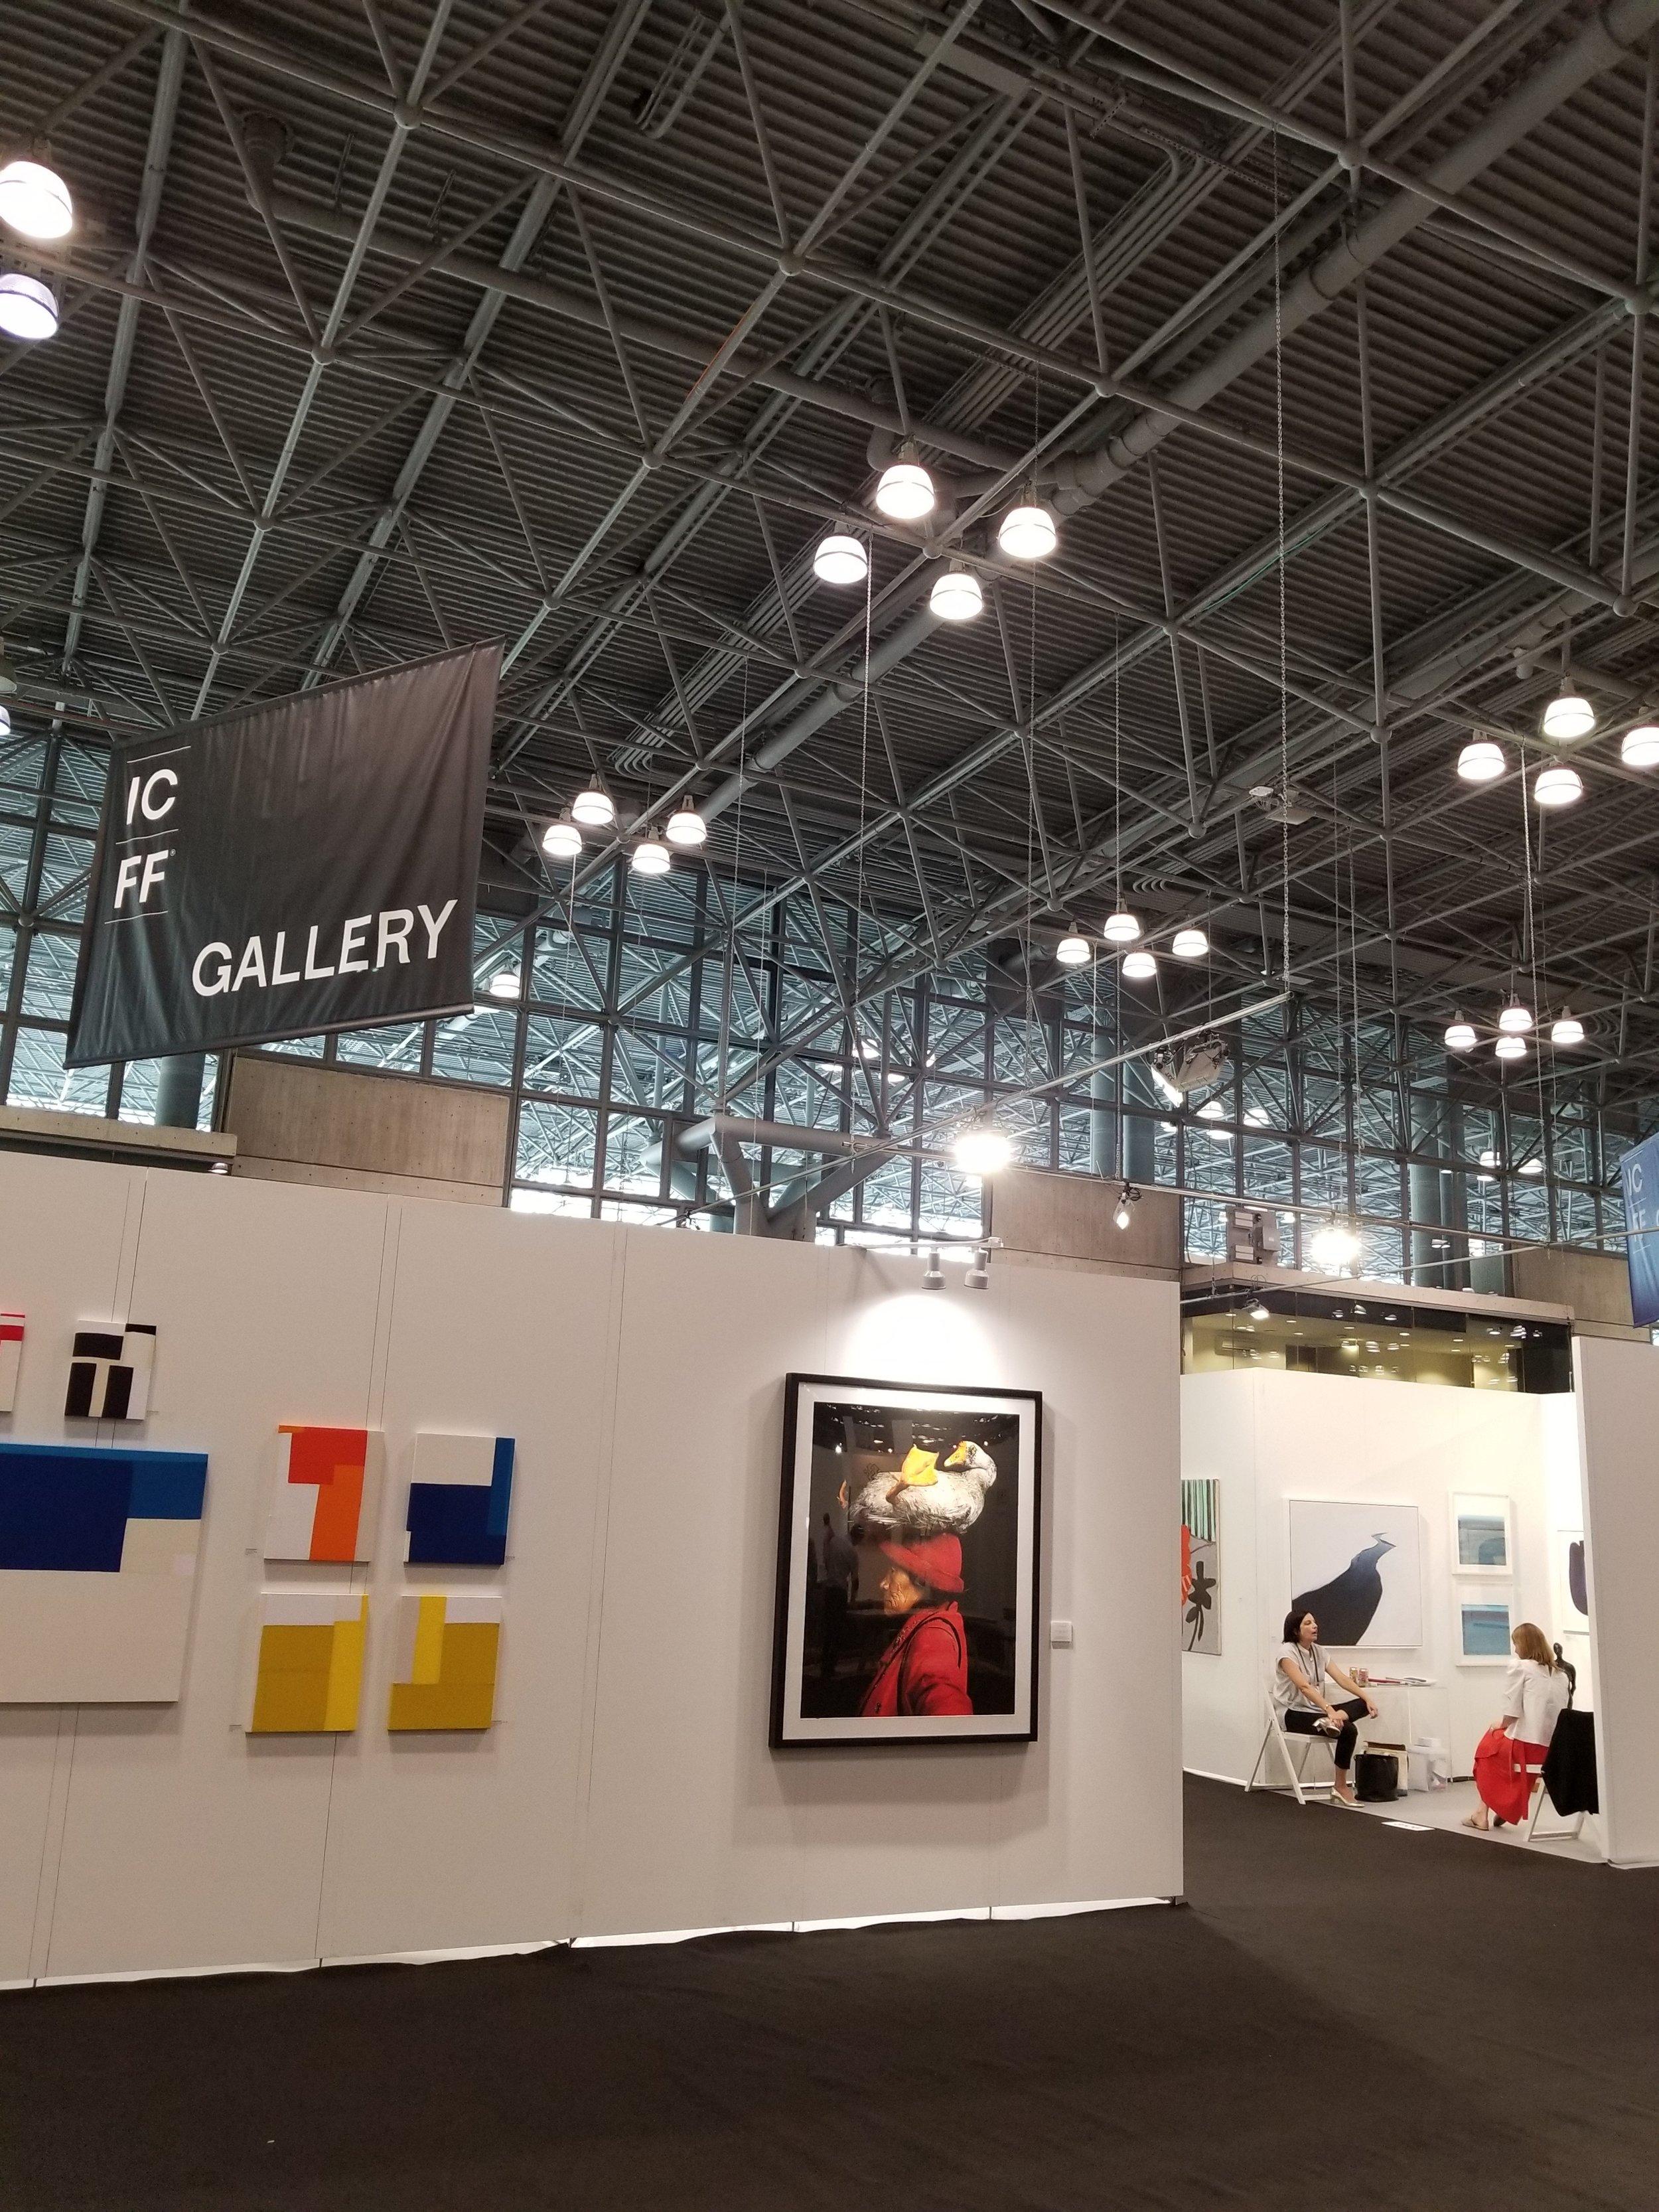 ICFF Gallery